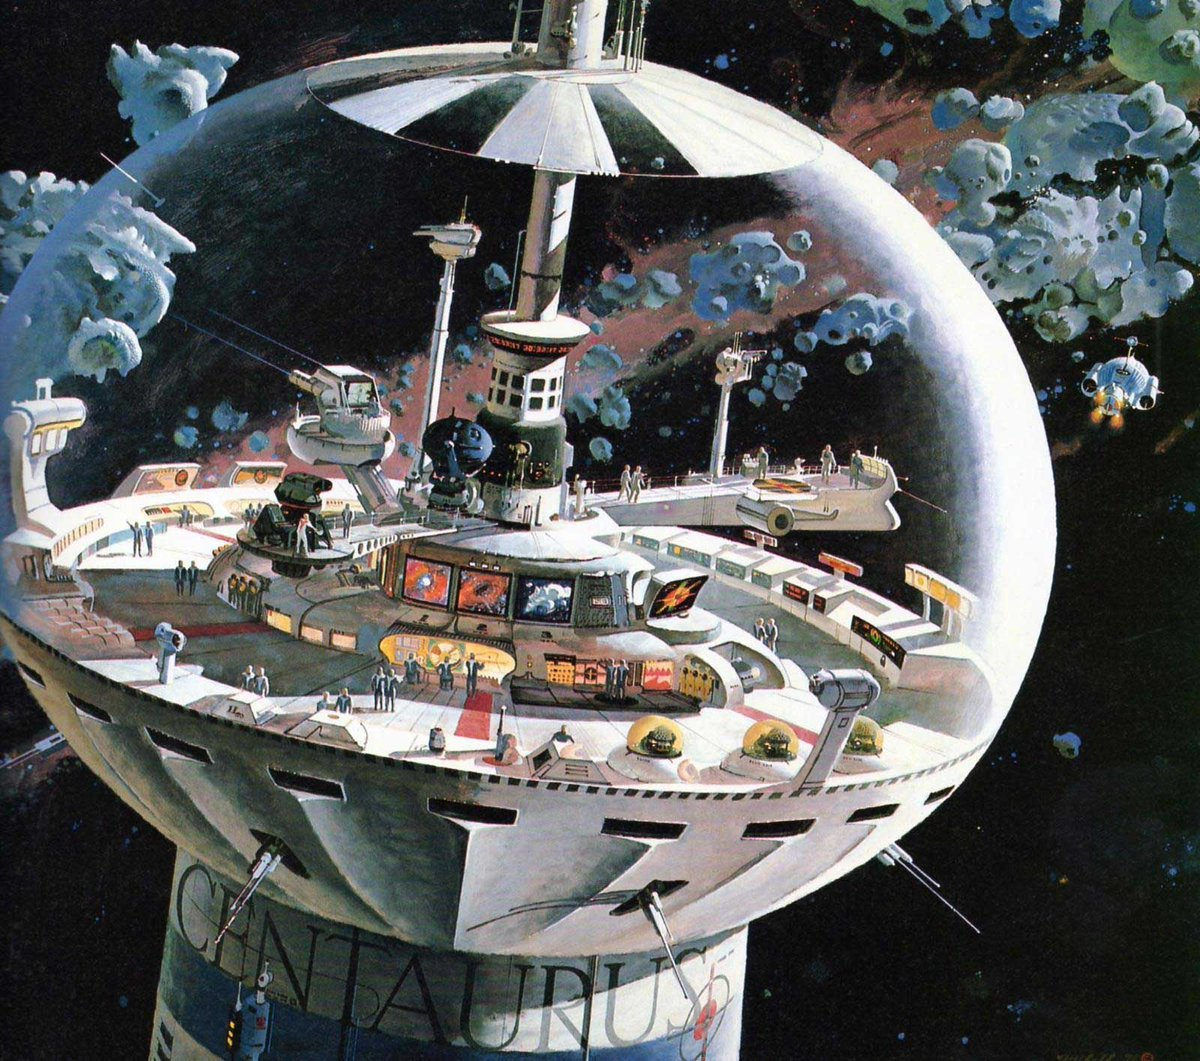 Disney's 'The Black Hole' Concept Art By Robert McCall  #Disney #BlackHole #theblackhole #space #outerspace #McCall #satellite #conceptart #art #concept #painting #movie #film #filmconcept #movieconcept #sciencefiction #scifi #1970s #70s #illustration https://t.co/NuNkqOswMj